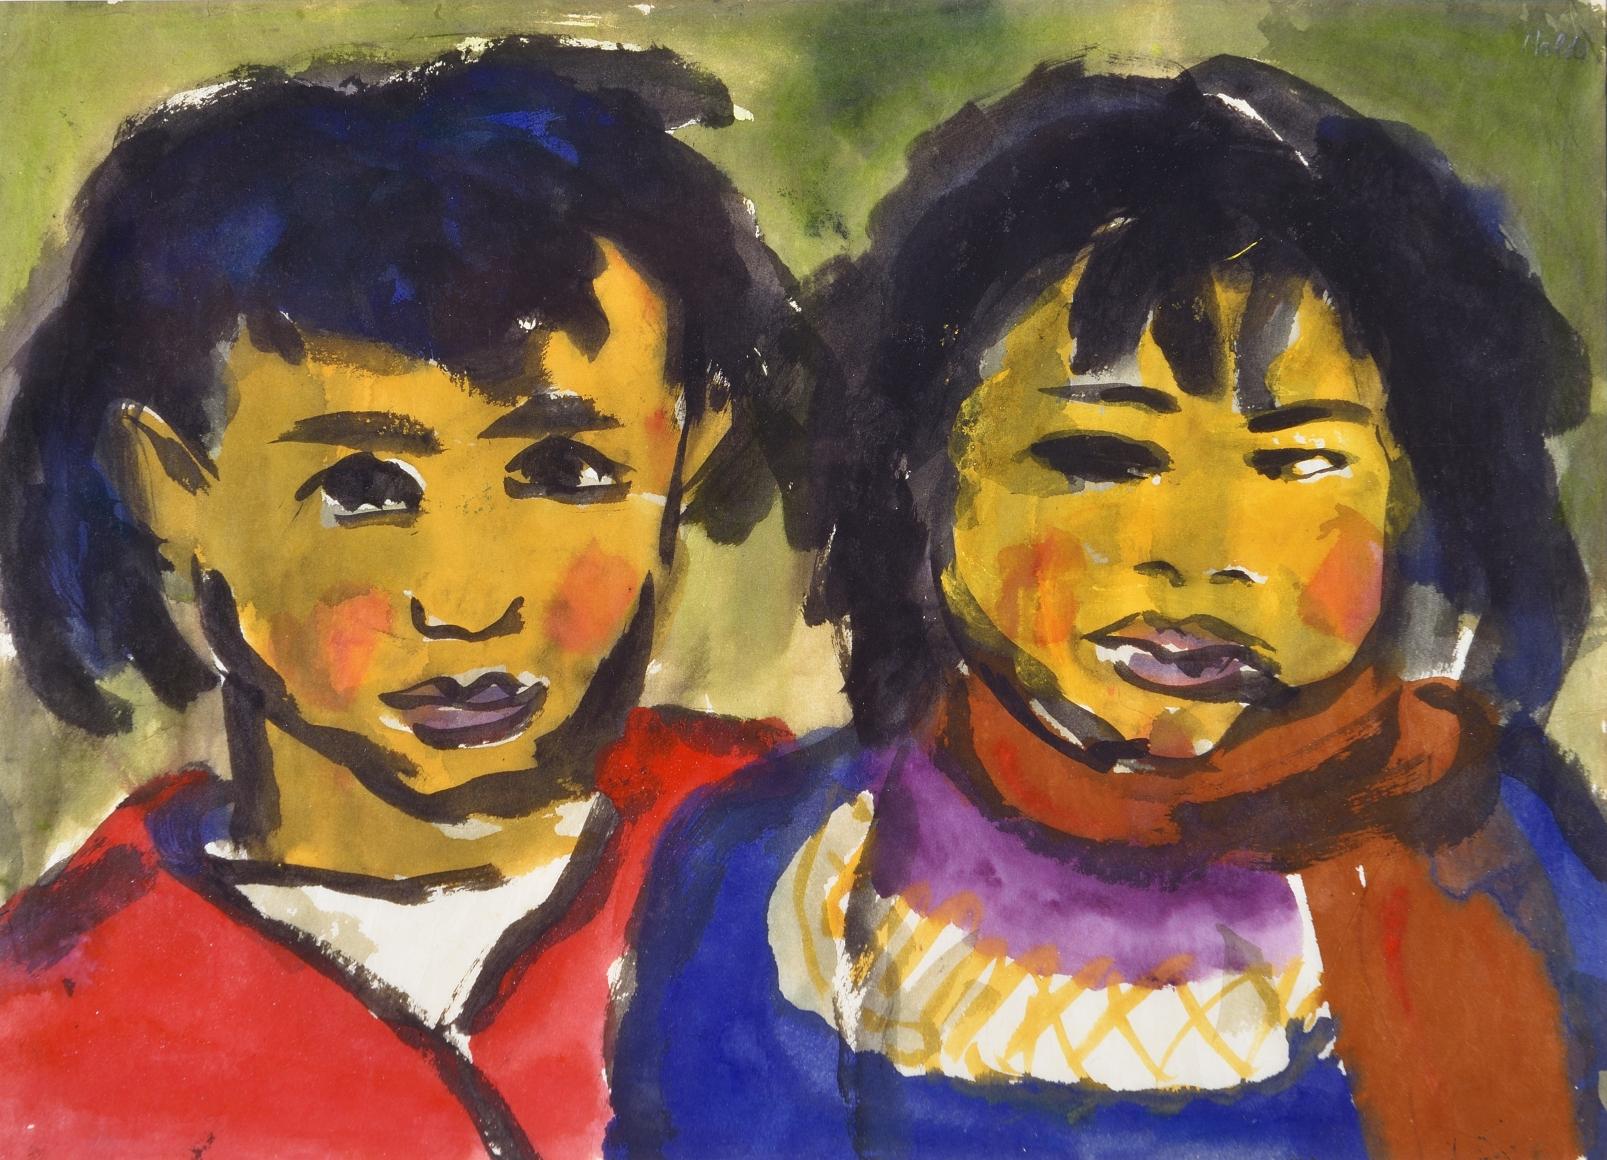 Emil Nolde, Two Children, c. 1918, Watercolor on paper, 13 3/4 x 18 1/2 in. (34.9 x 47 cm)